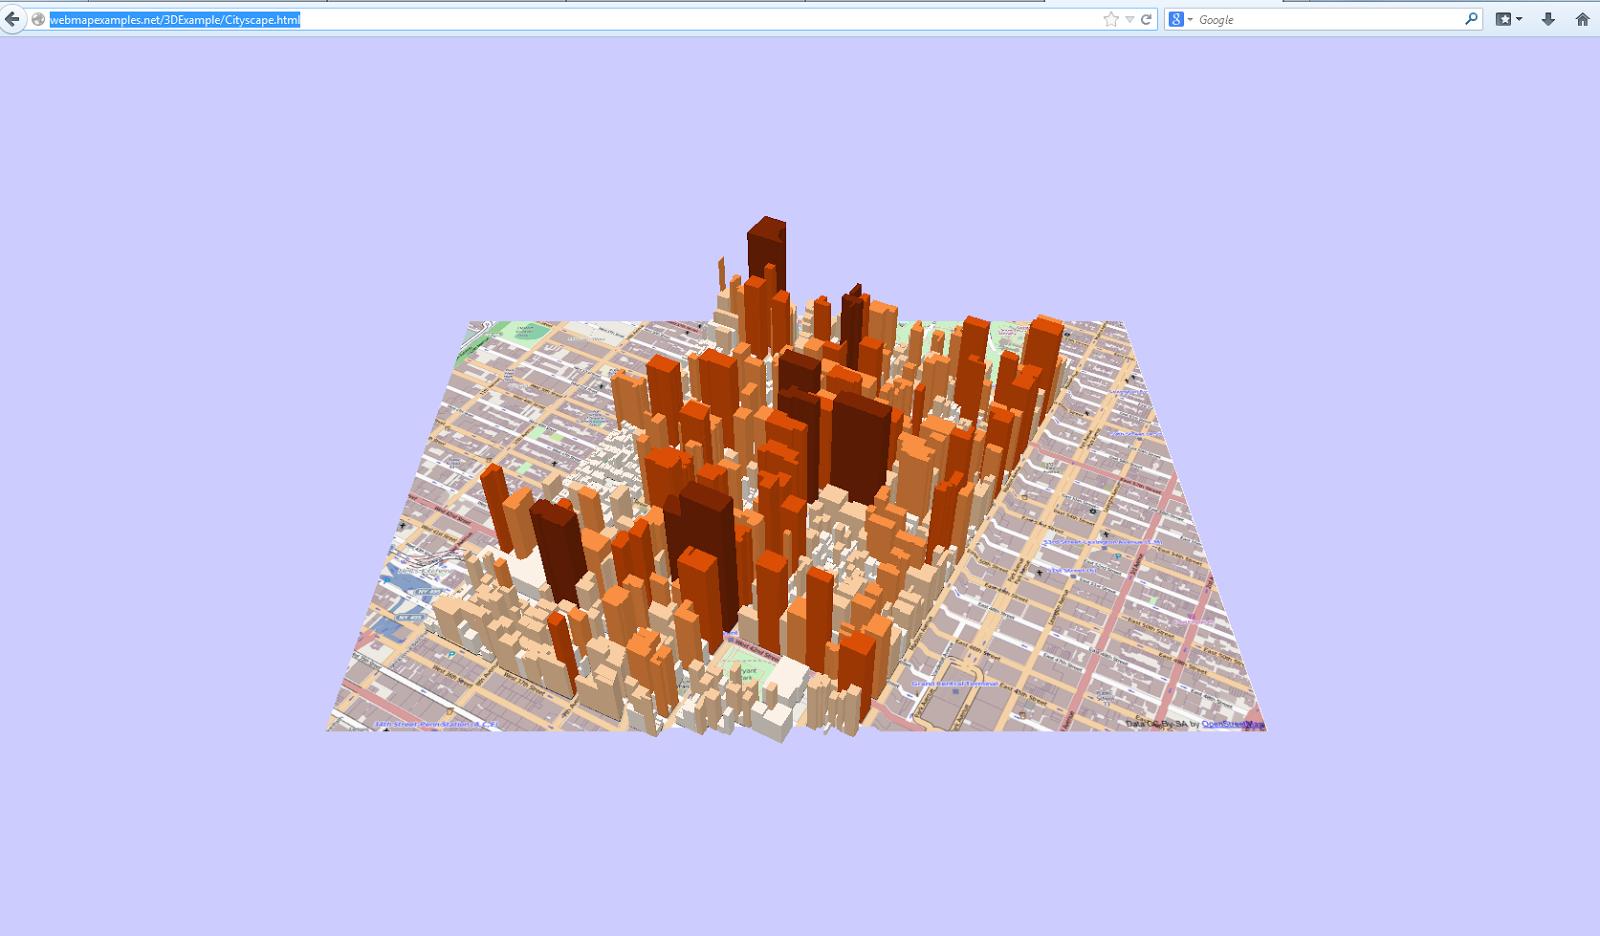 Open Source GIS Blog: 3D Visualization of Manhattan using QGIS Plugin